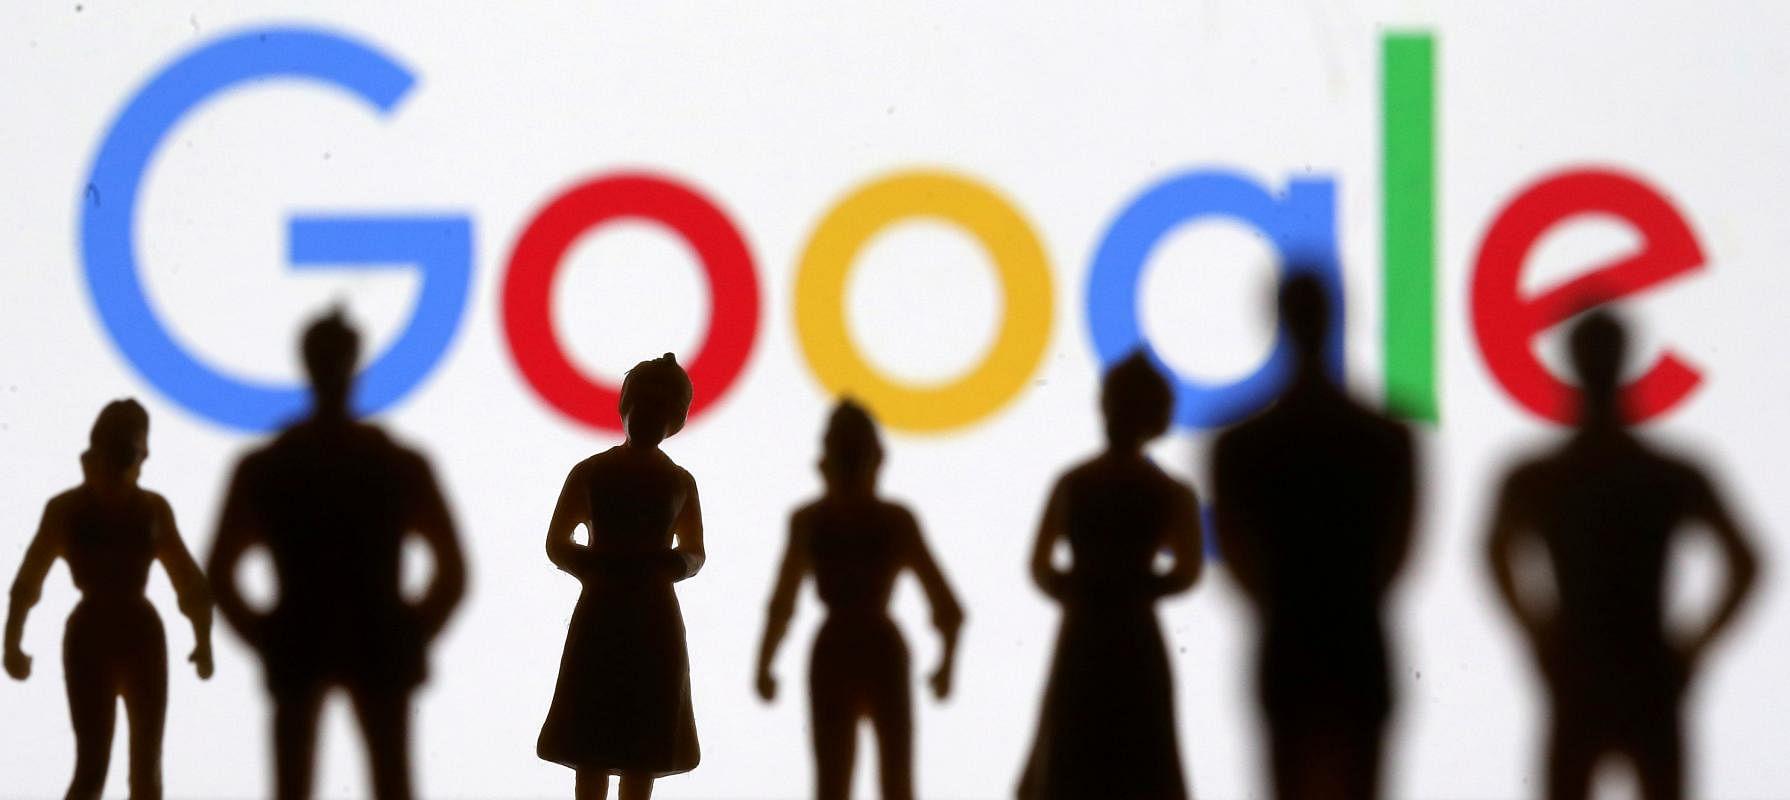 google_logo_Large.jpg